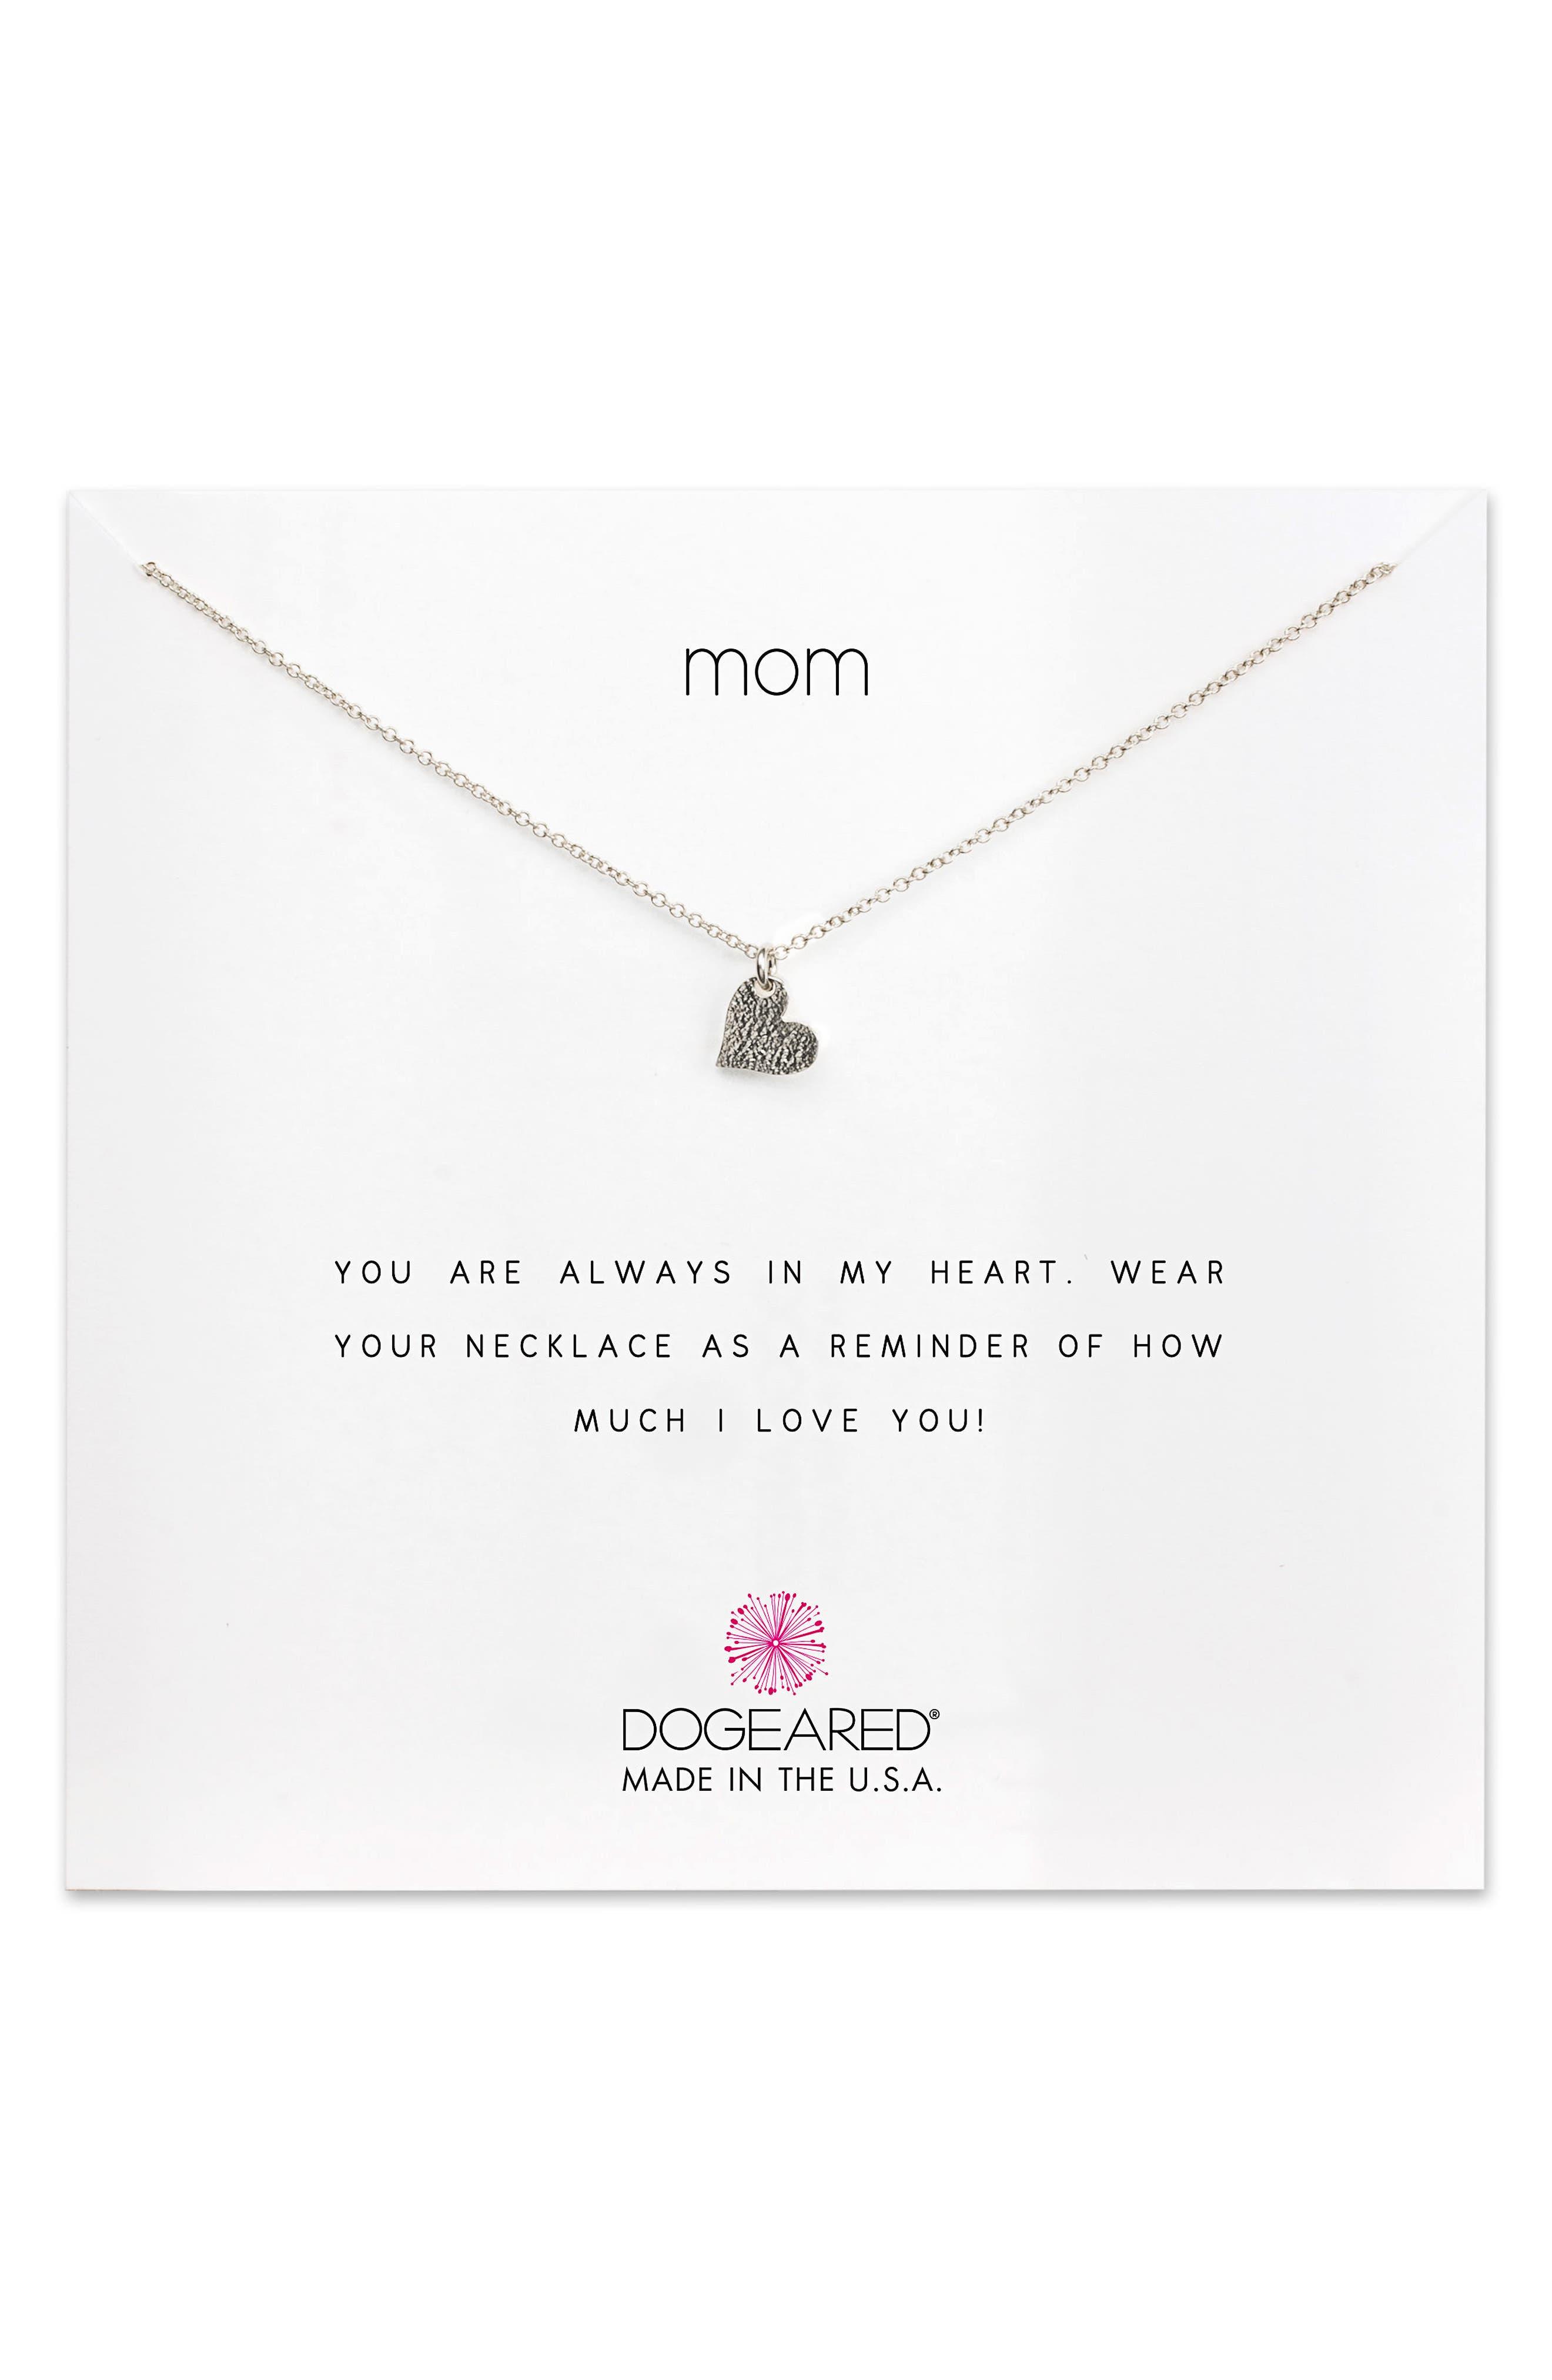 Mom Pendant Necklace,                         Main,                         color, 042